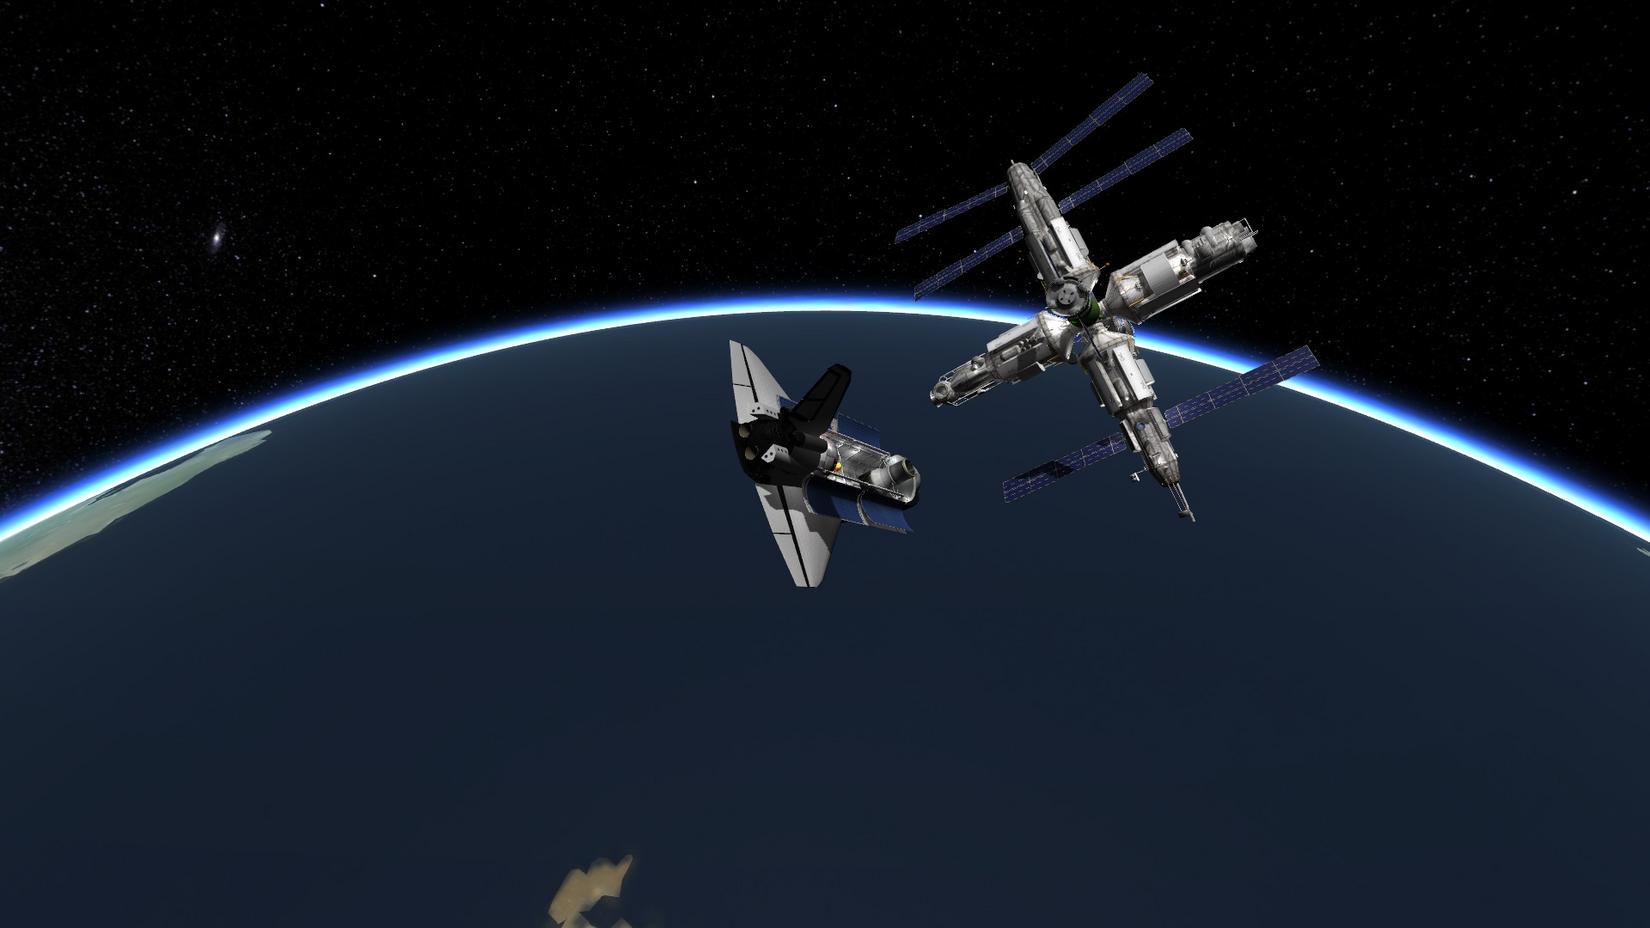 ksp space station mir - photo #3